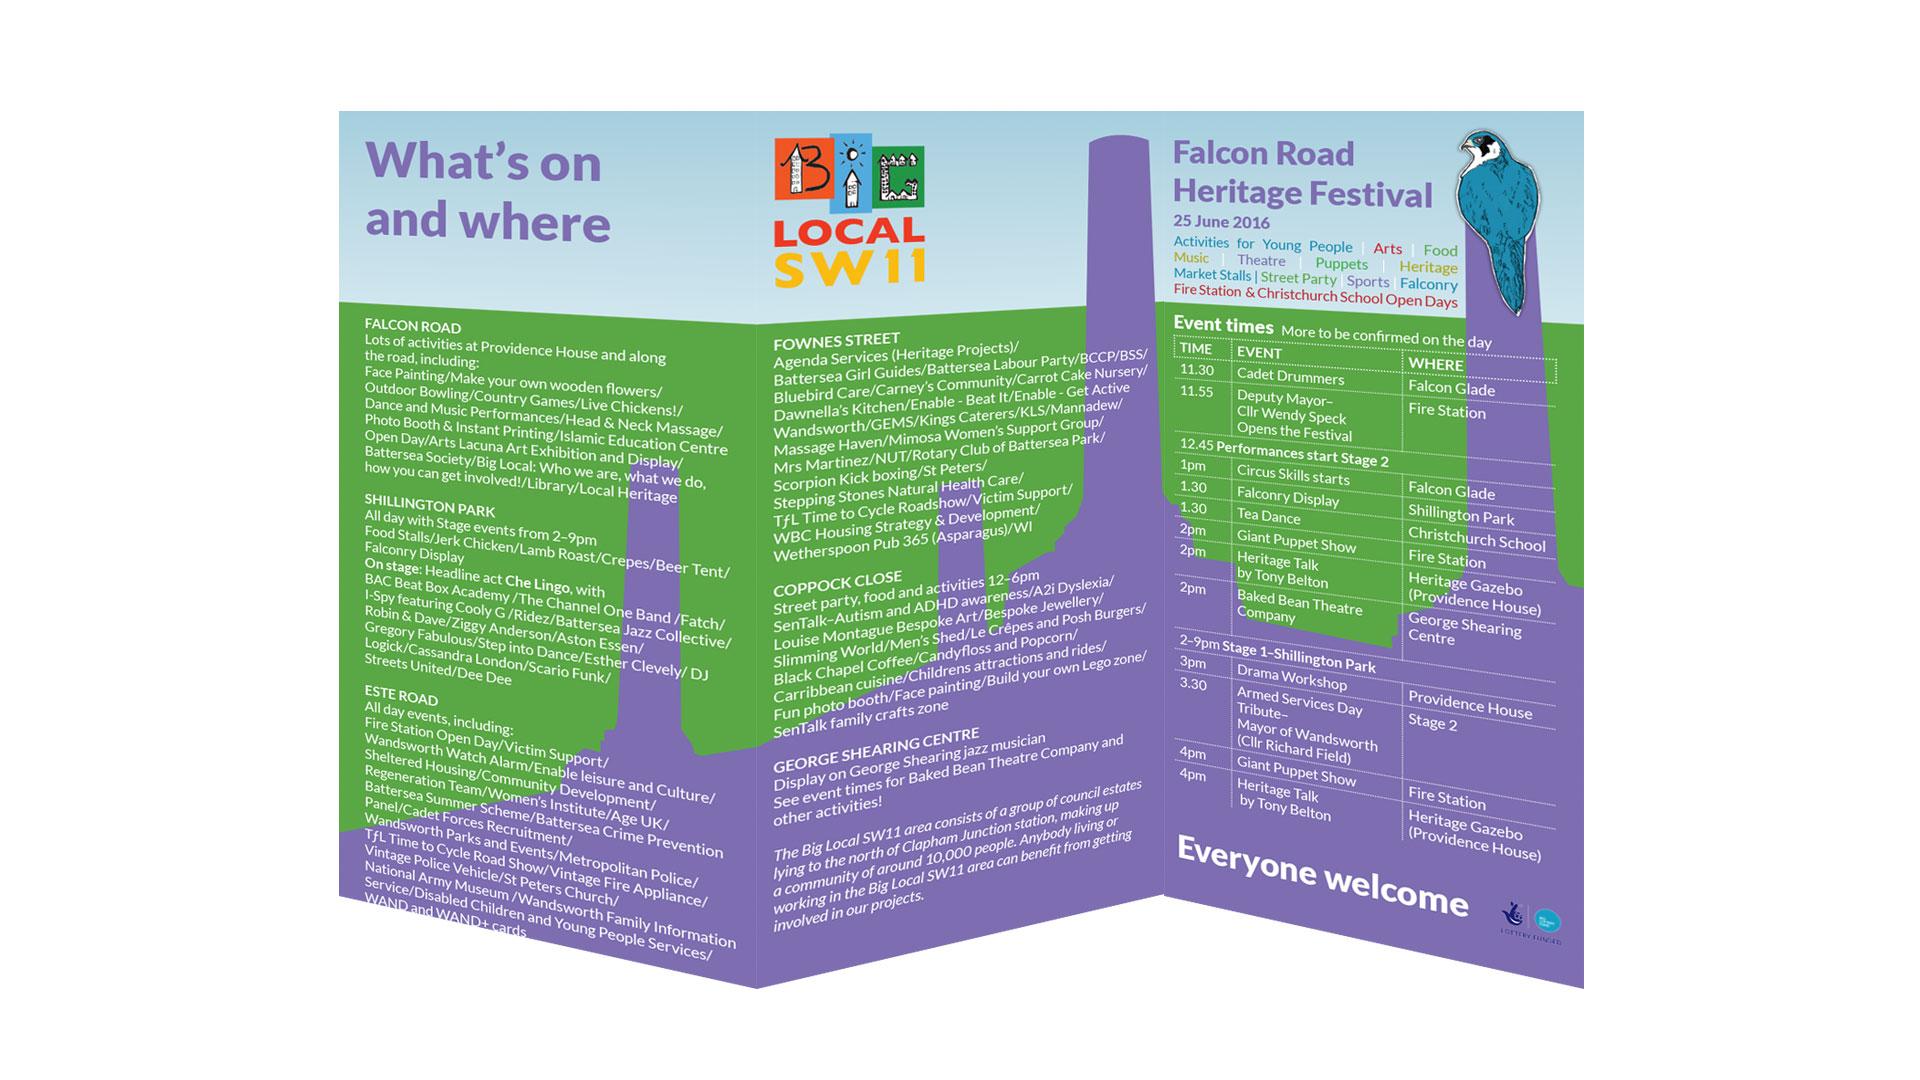 falcon-road-sw11-heritage-festival brochure